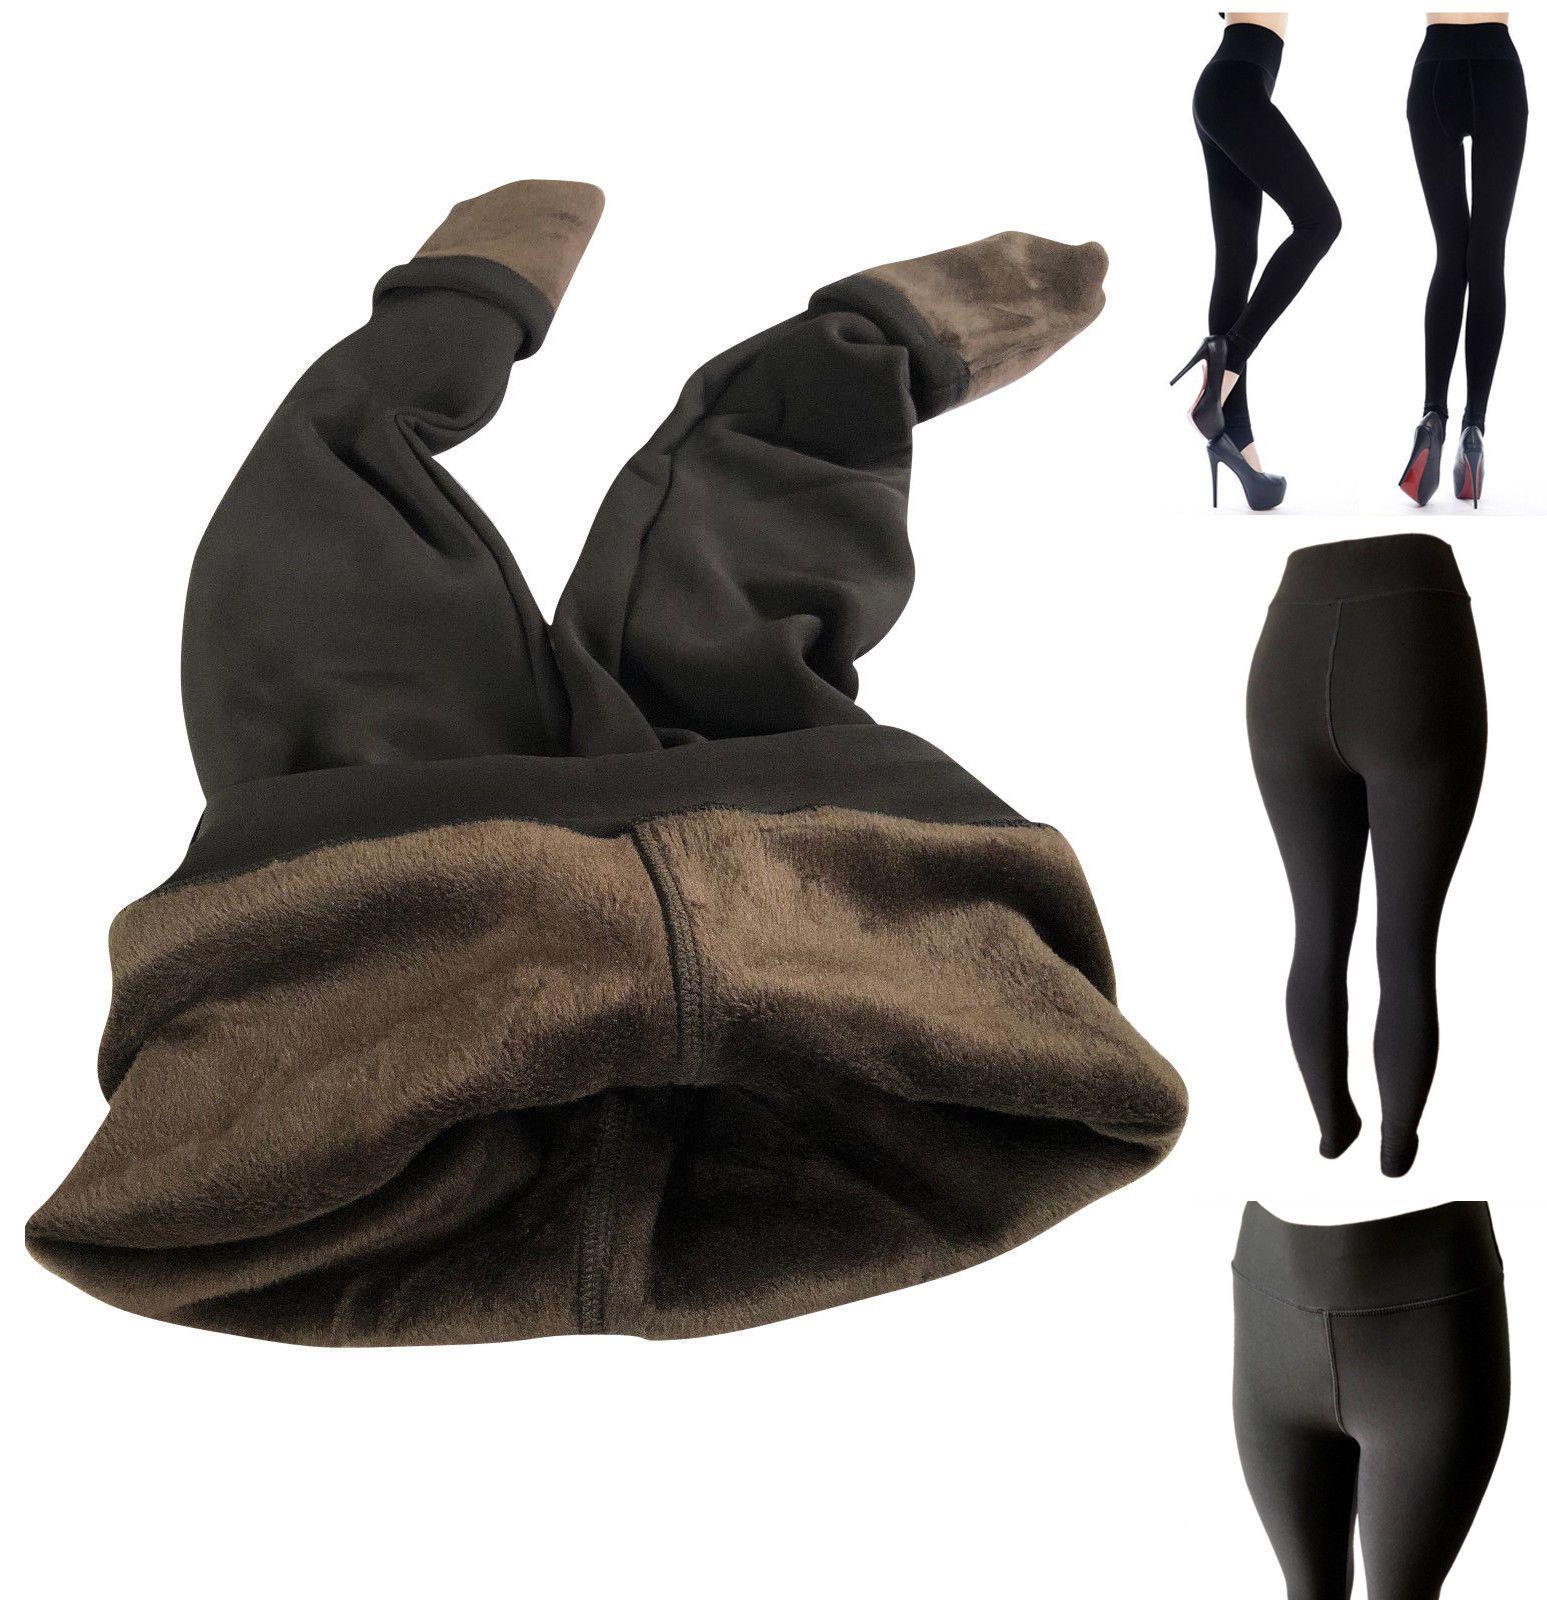 3ea61e74cf14ee Leggings 169001: Women Winter Fleece Fur Lined Extra Warm Thick Thermal  Leggings Active Pants -> BUY IT NOW ONLY: $13.99 on #eBay #leggings #women  #winter ...